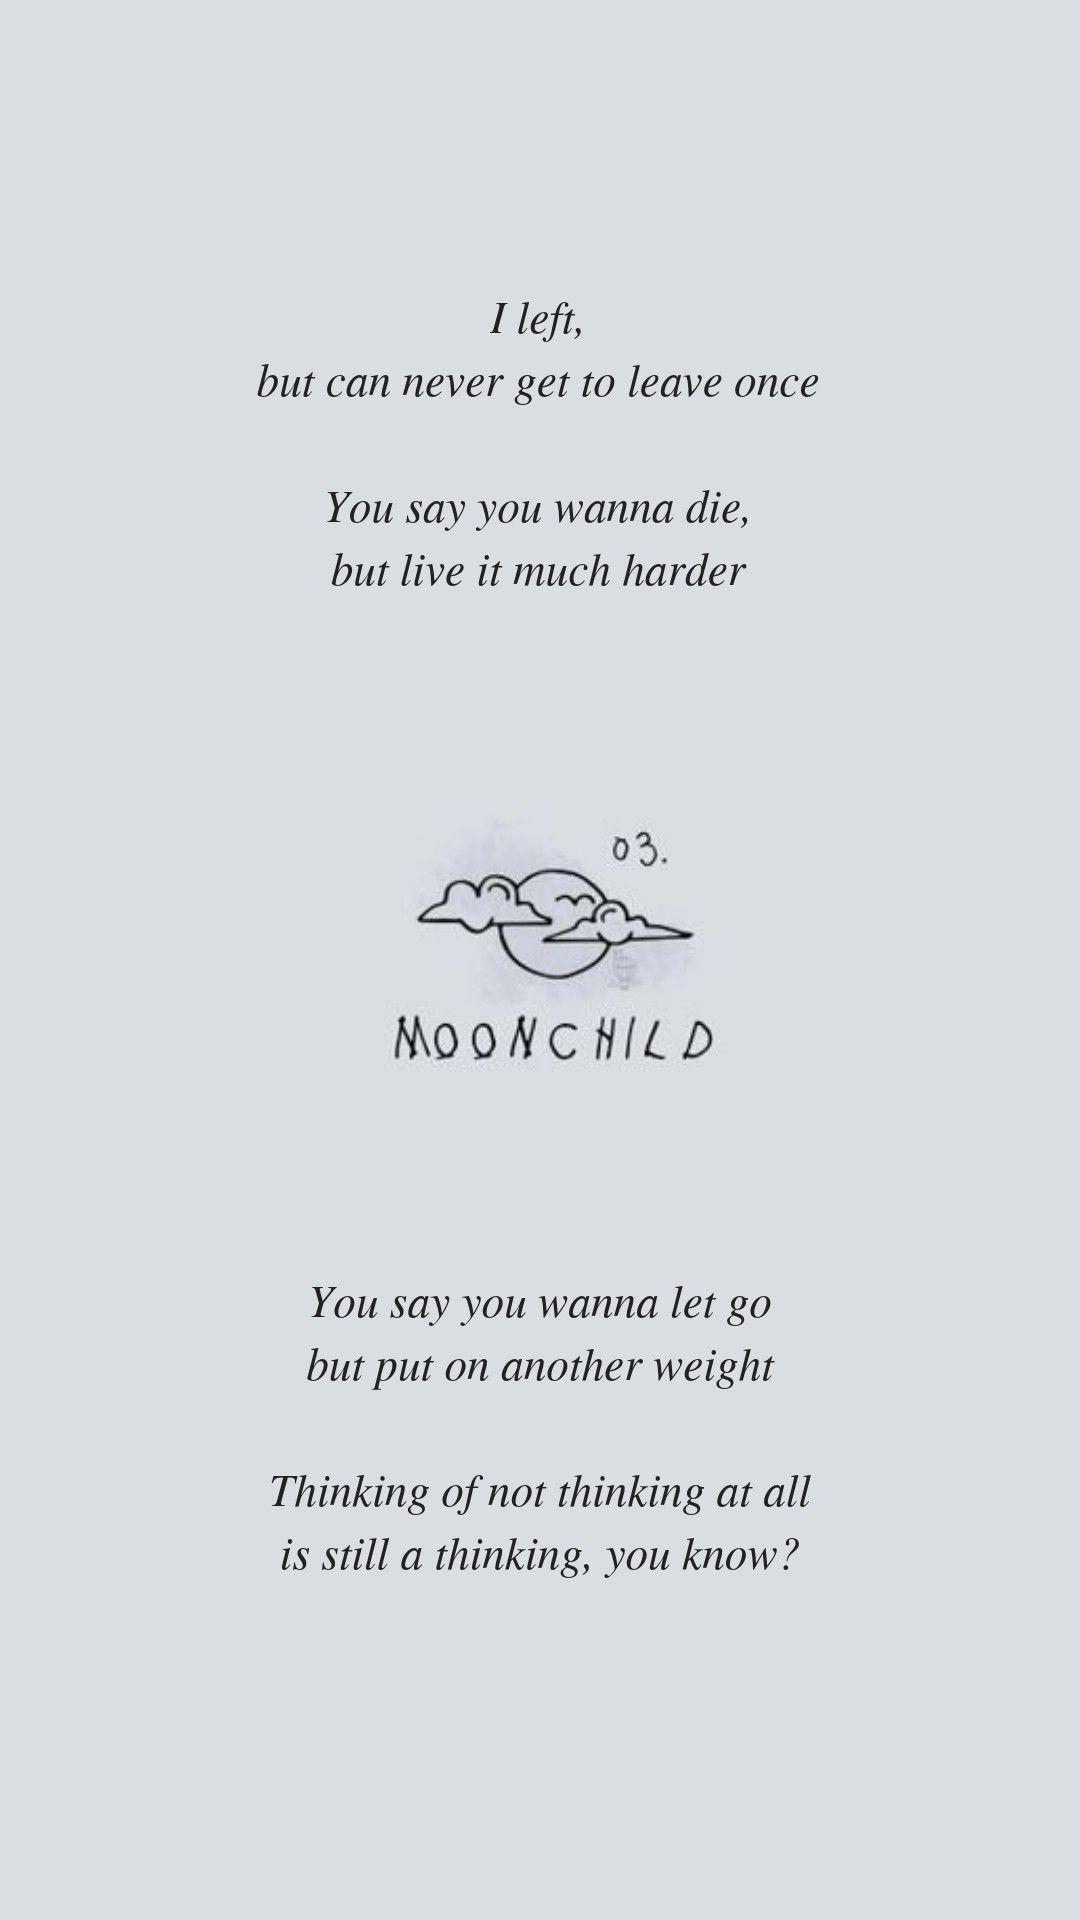 Moonchild By Bts Rm Lyrics Wallpaper Bts Lyrics Quotes Bts Lyric Bts Wallpaper Lyrics